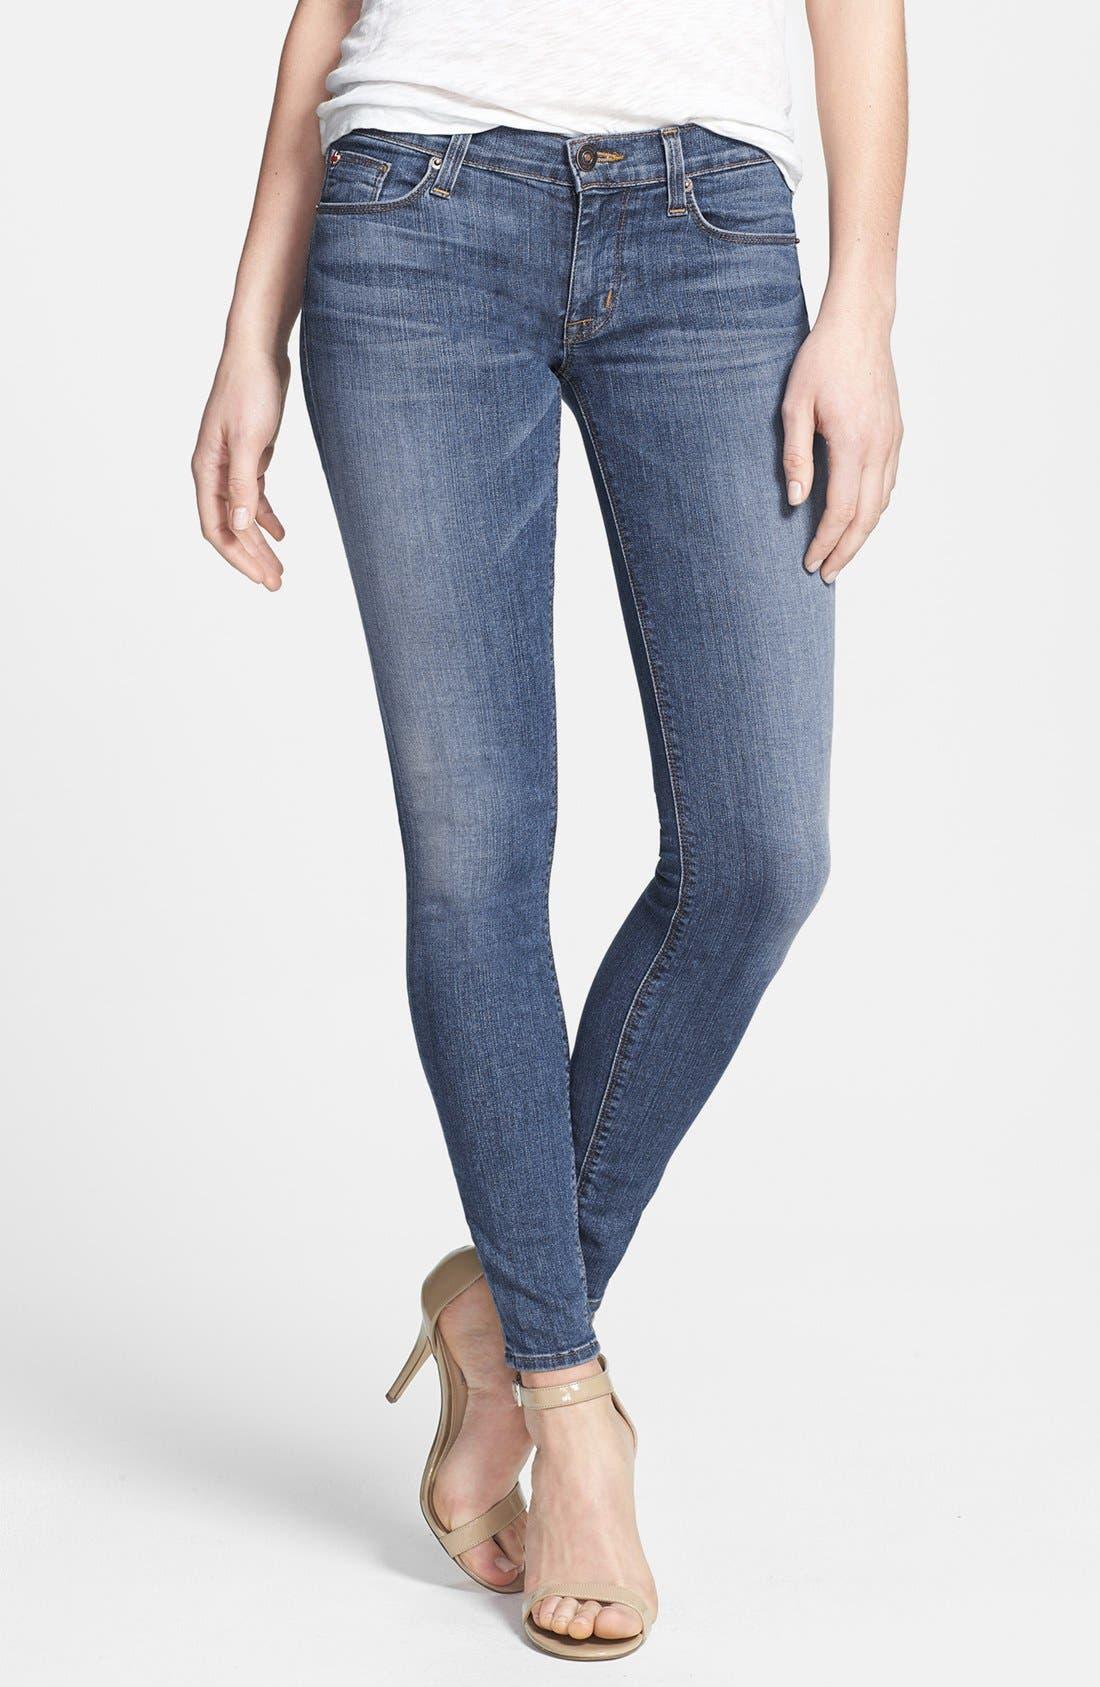 Main Image - Hudson Jeans 'Krista' Super Skinny Jeans (Floyd 2)